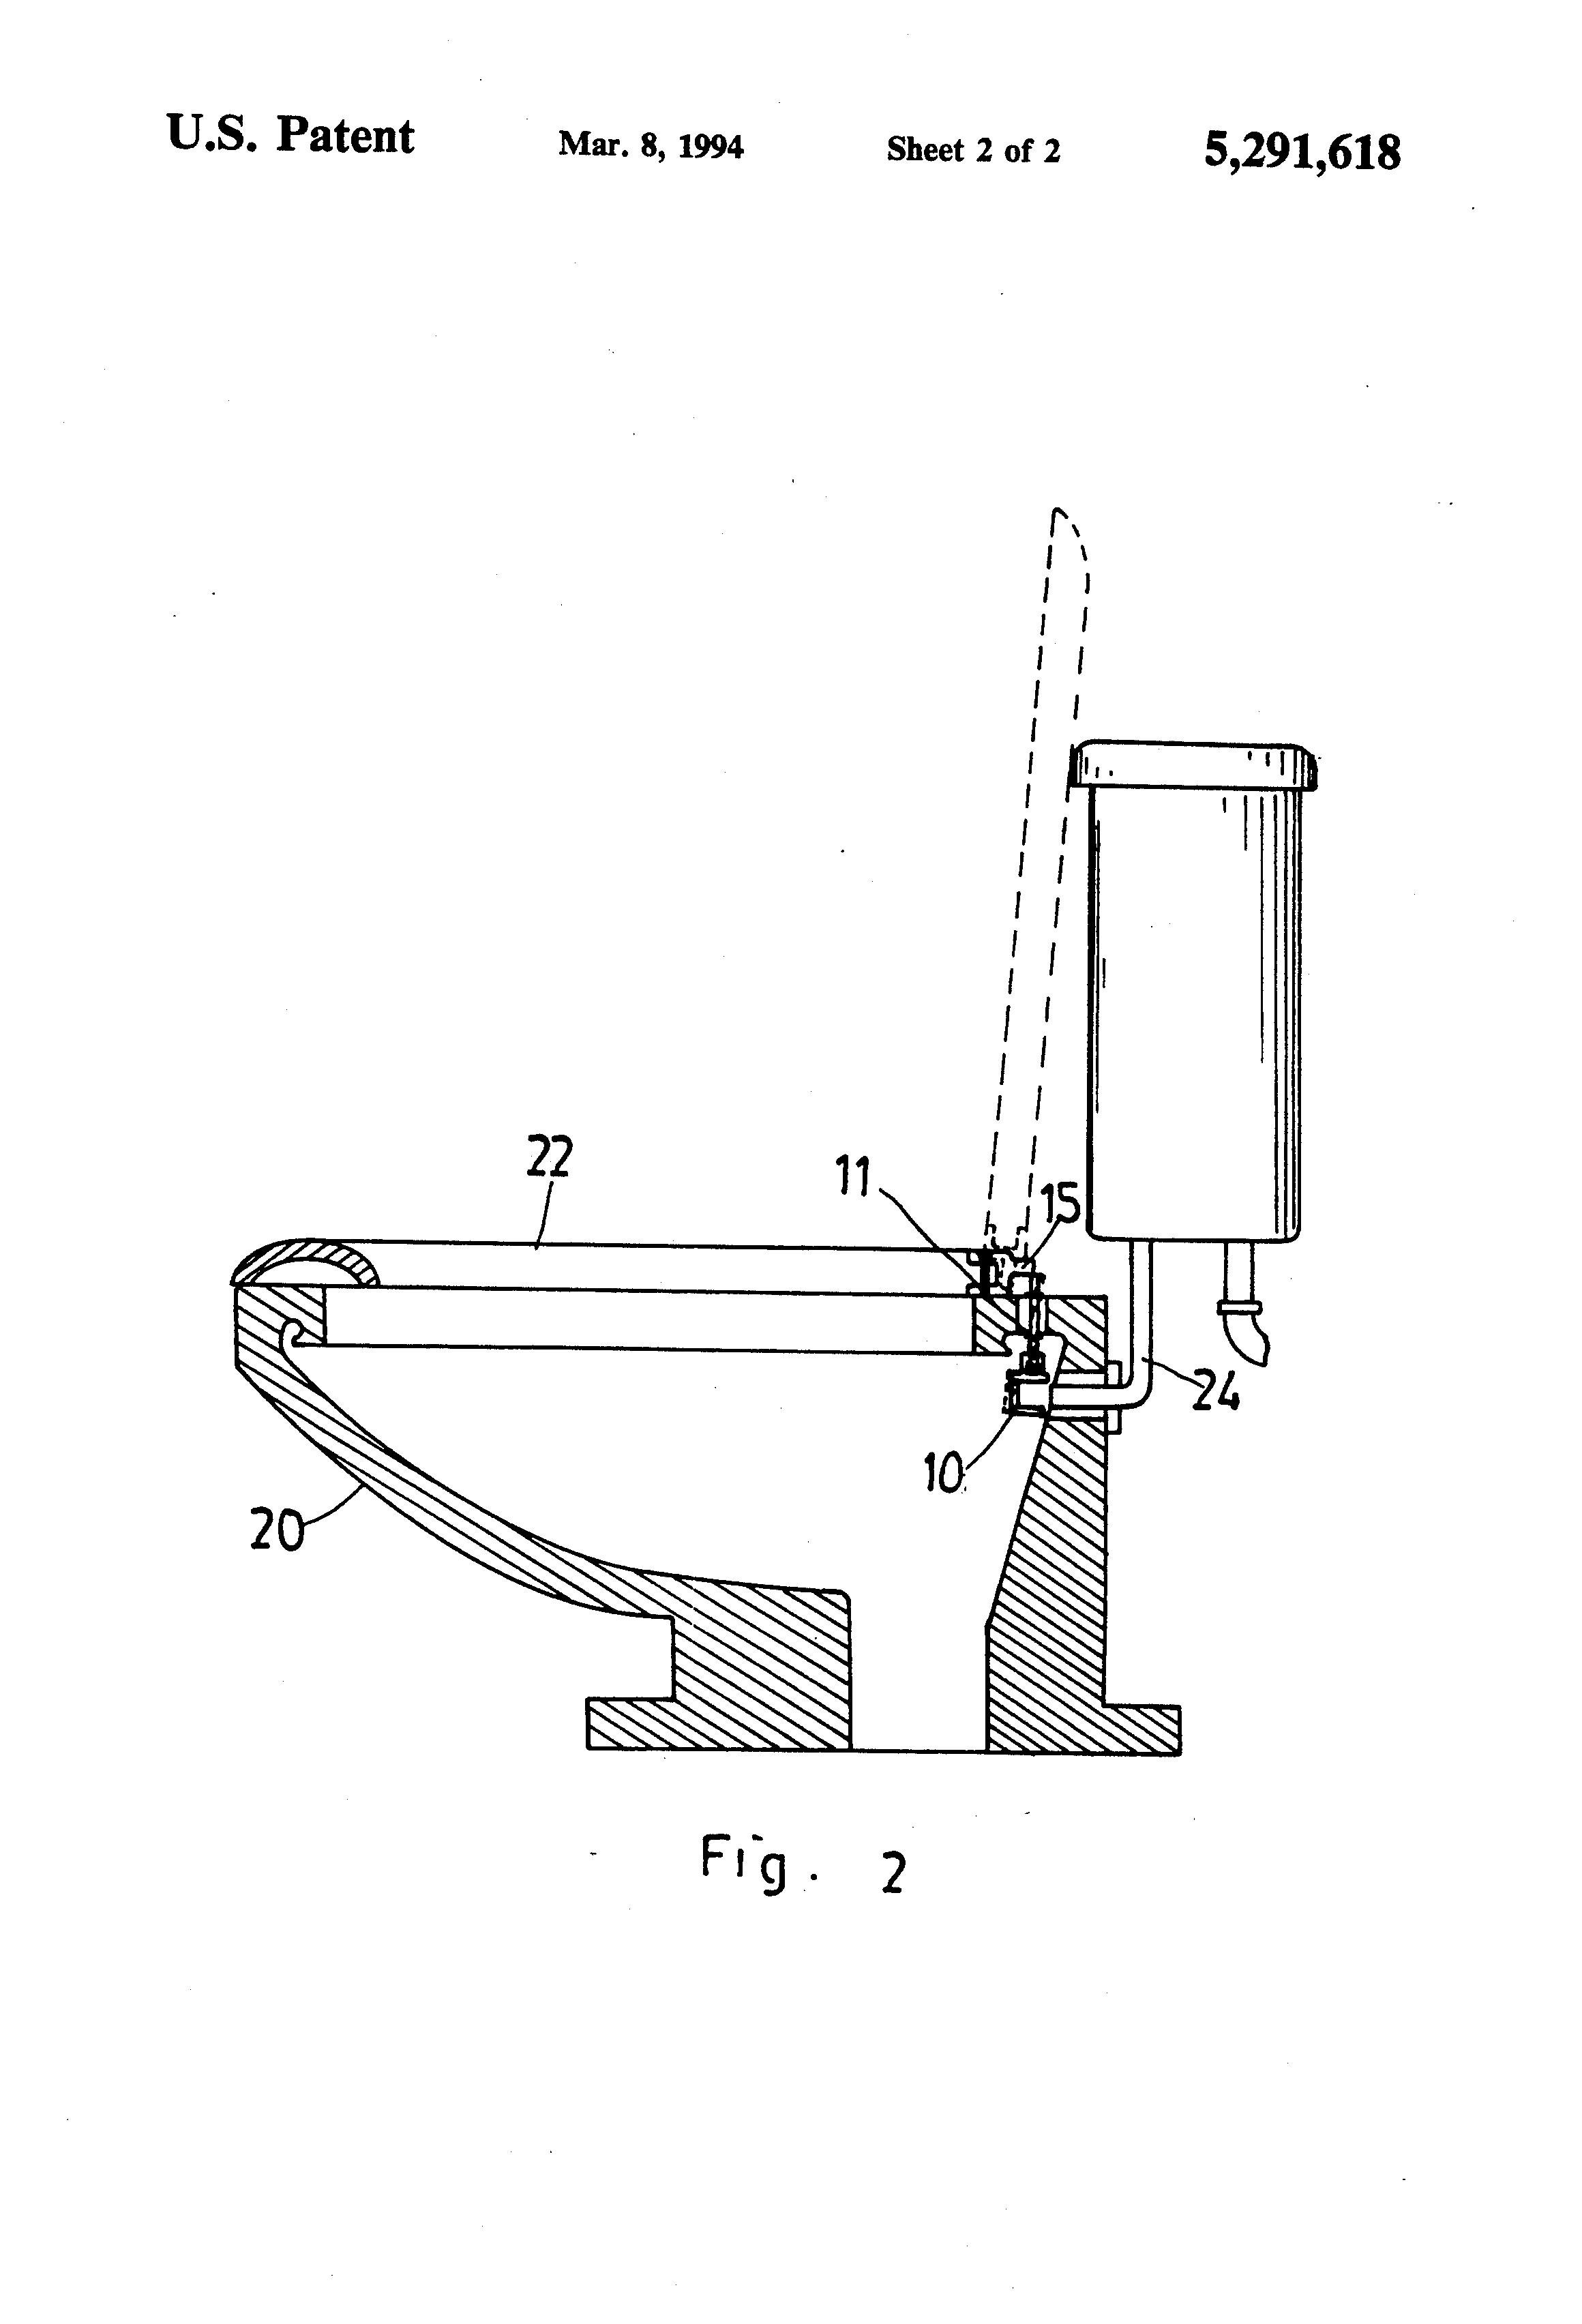 Seat Lift Mechanism : Patent us automatic toilet seat lift mechanism